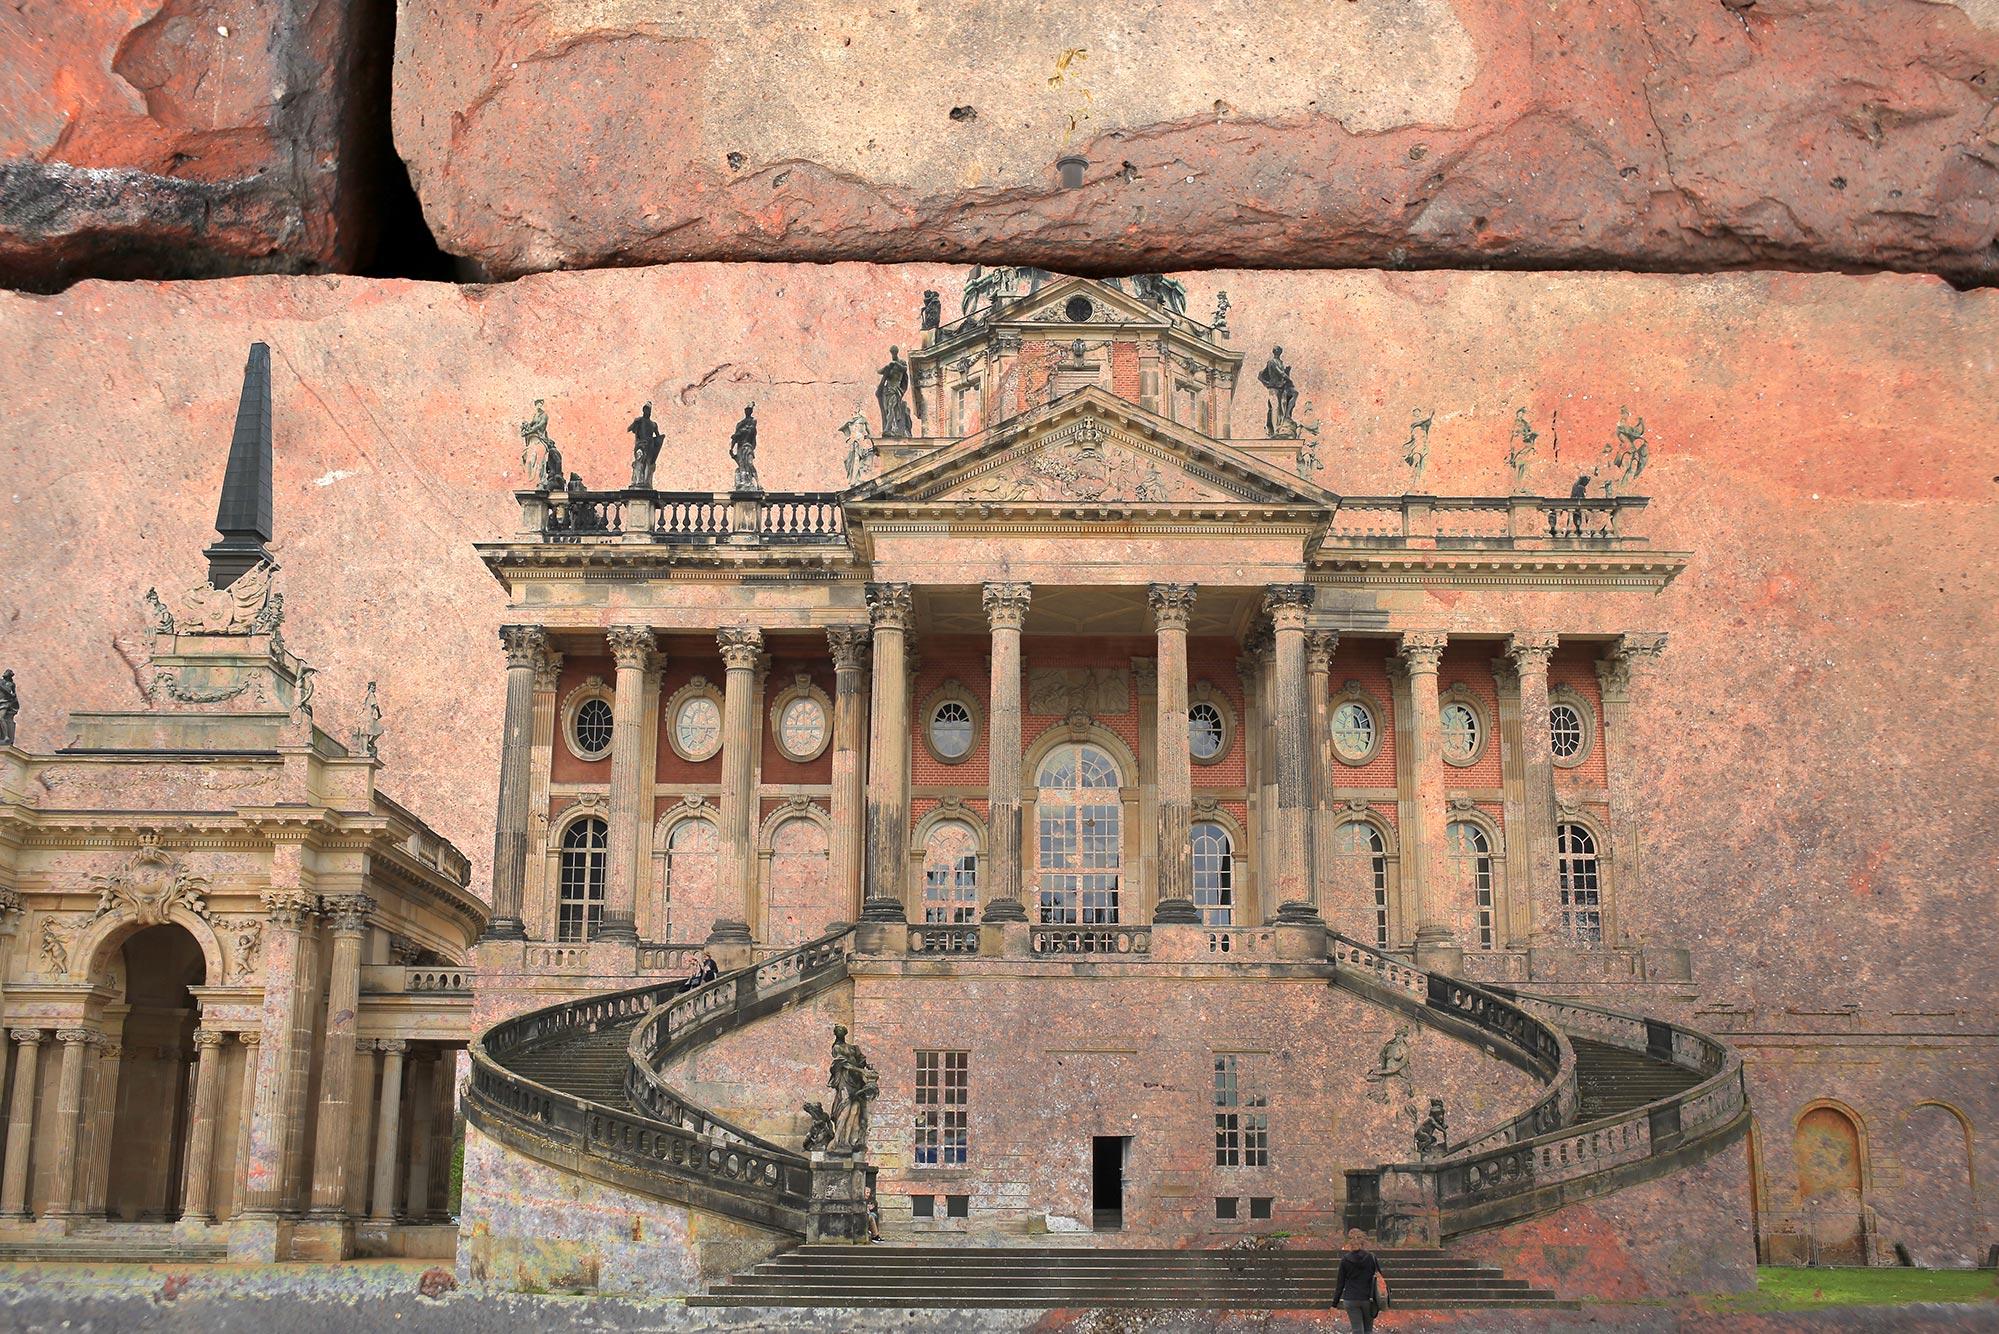 Communs am Neuen Palais in Potsdam, Doppelbelichtung